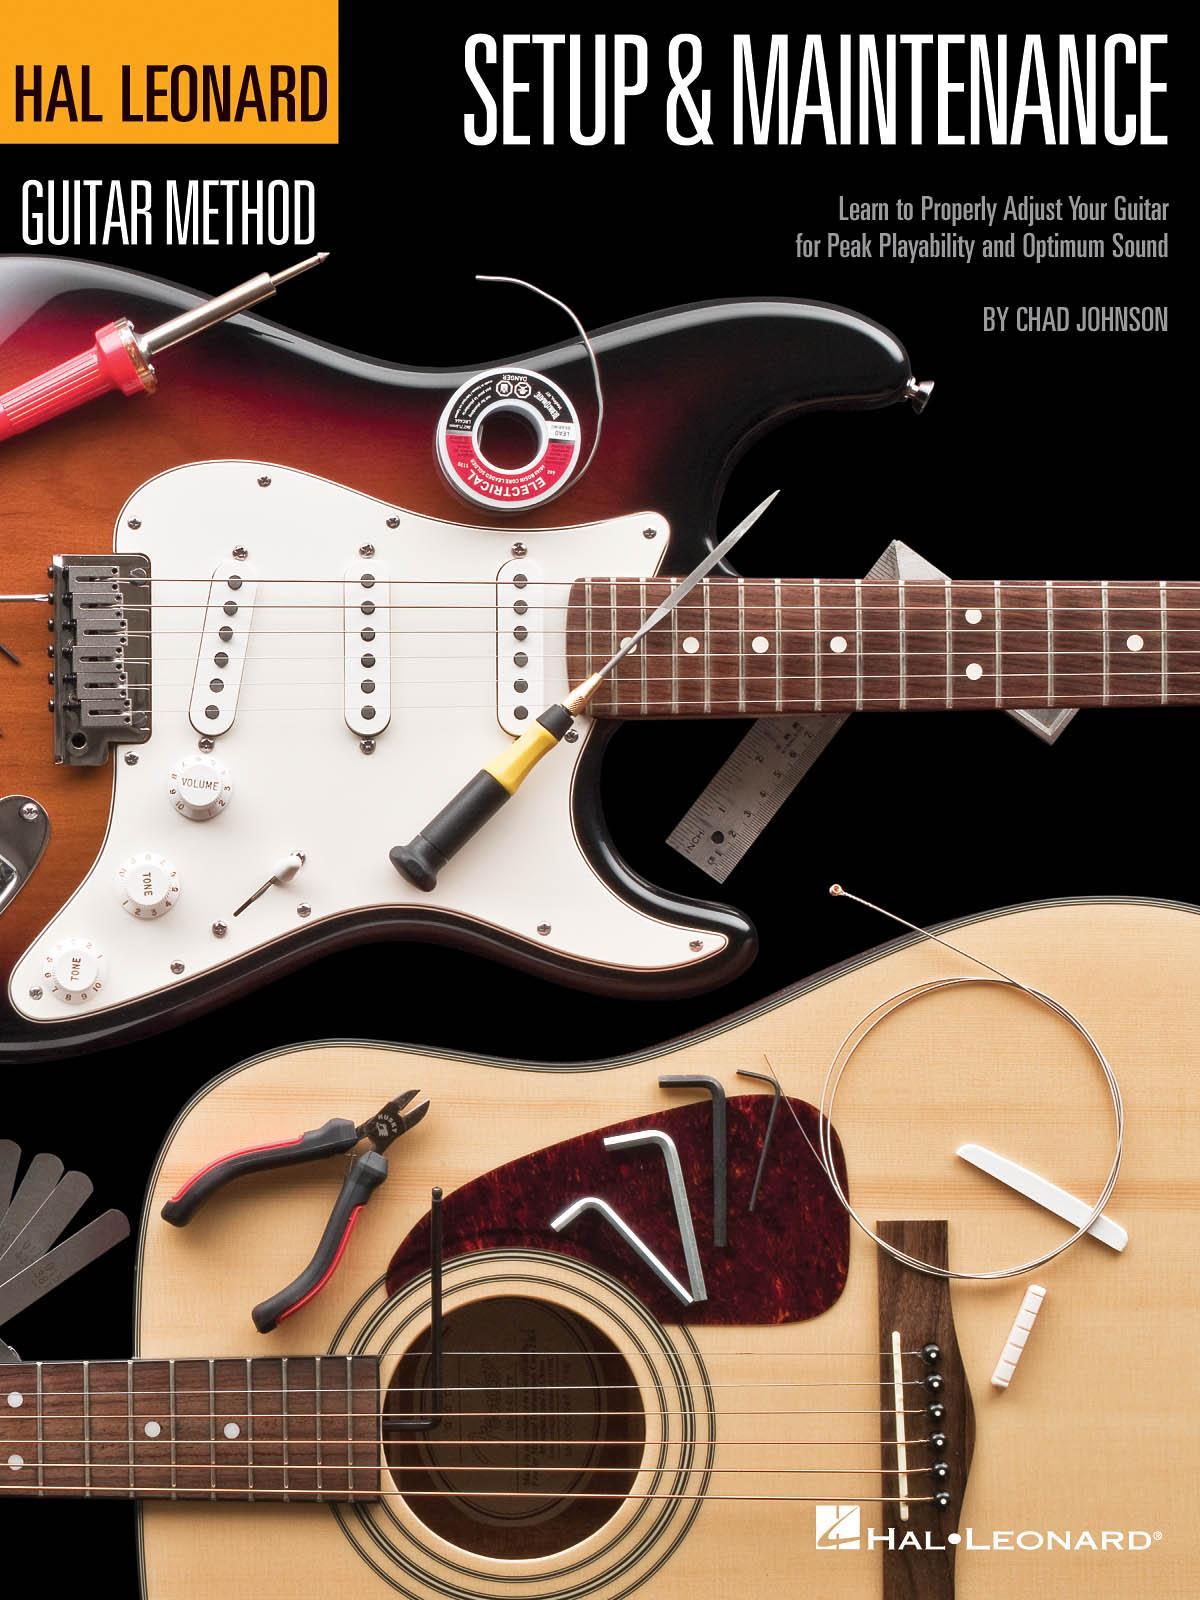 Hal Leonard Guitar Method - Setup & Maintenance: Guitar Solo: Reference